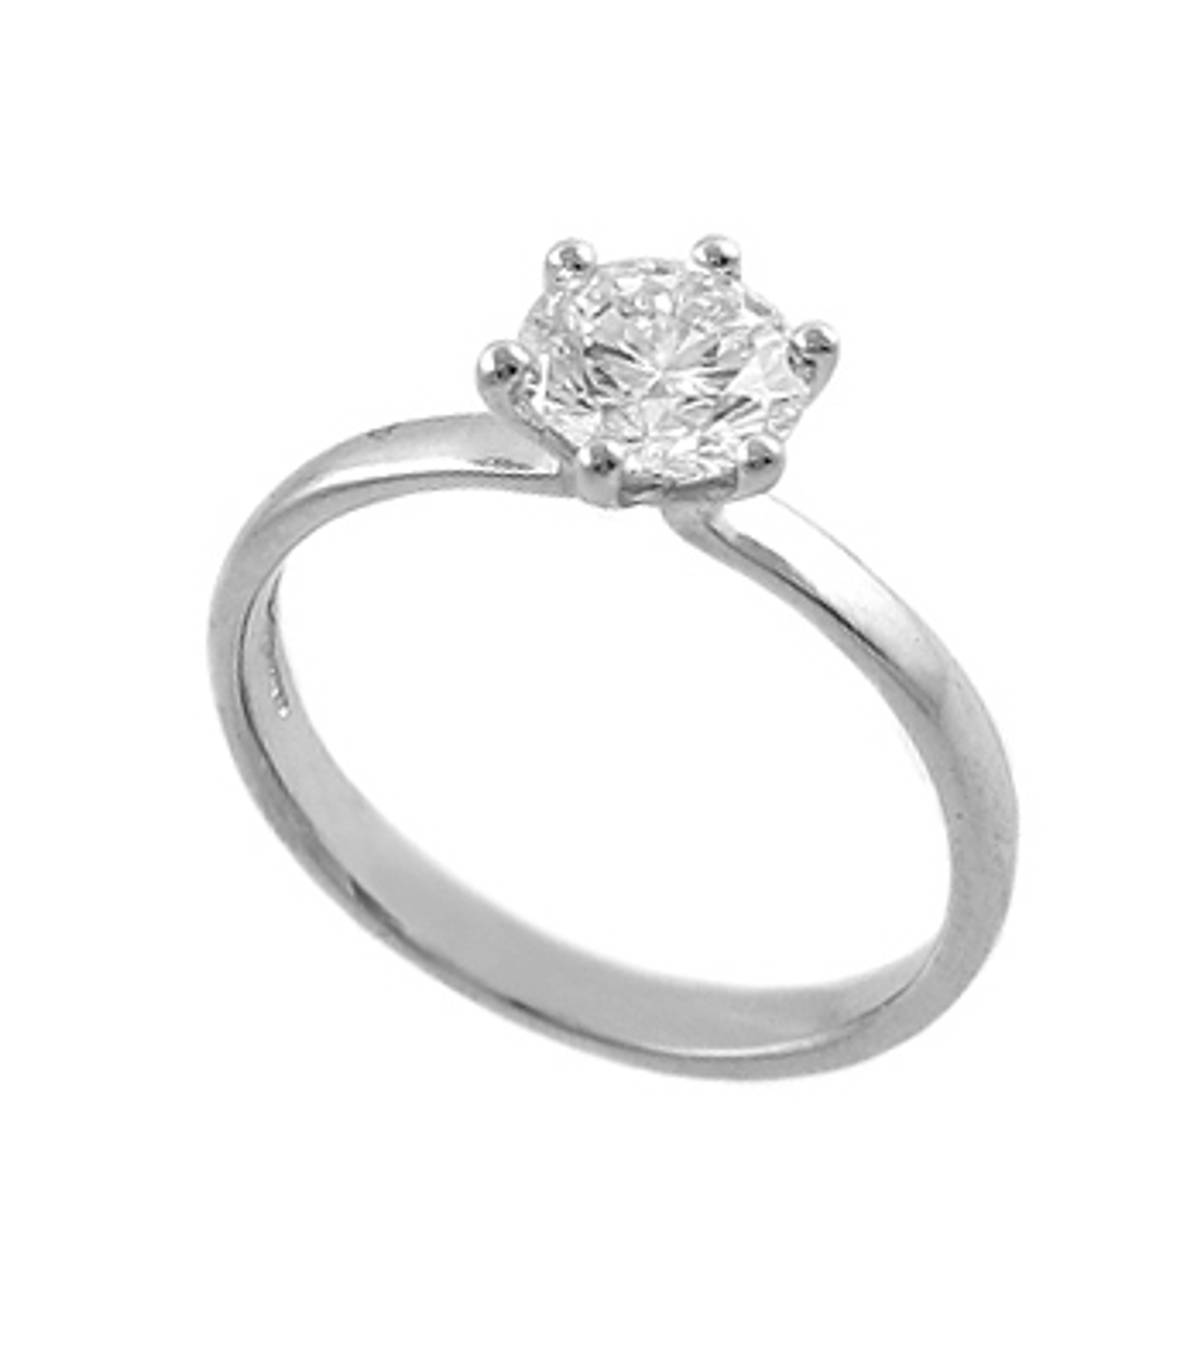 Irish madediamond solitaire engagement ring with 0.86 carat brilliant cutdiamond solitaire set in platinum